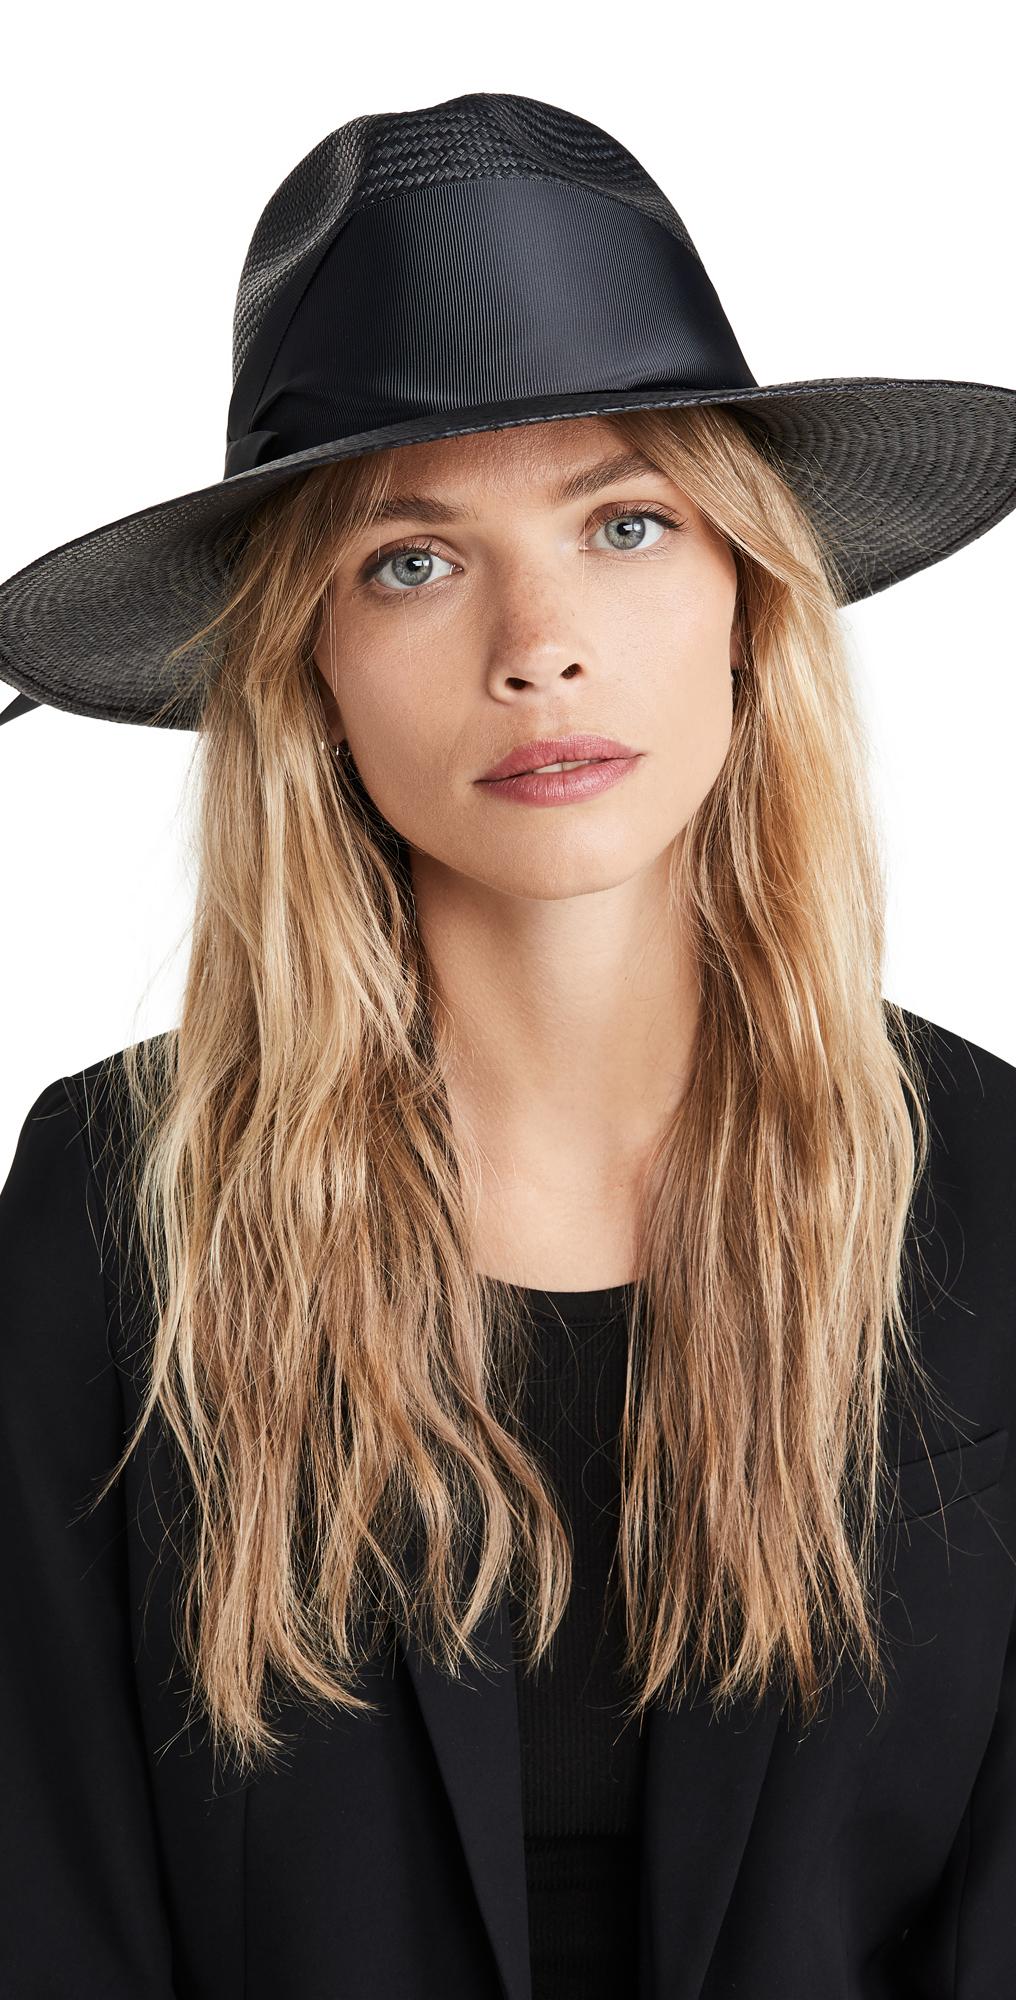 The Gardenia Hat